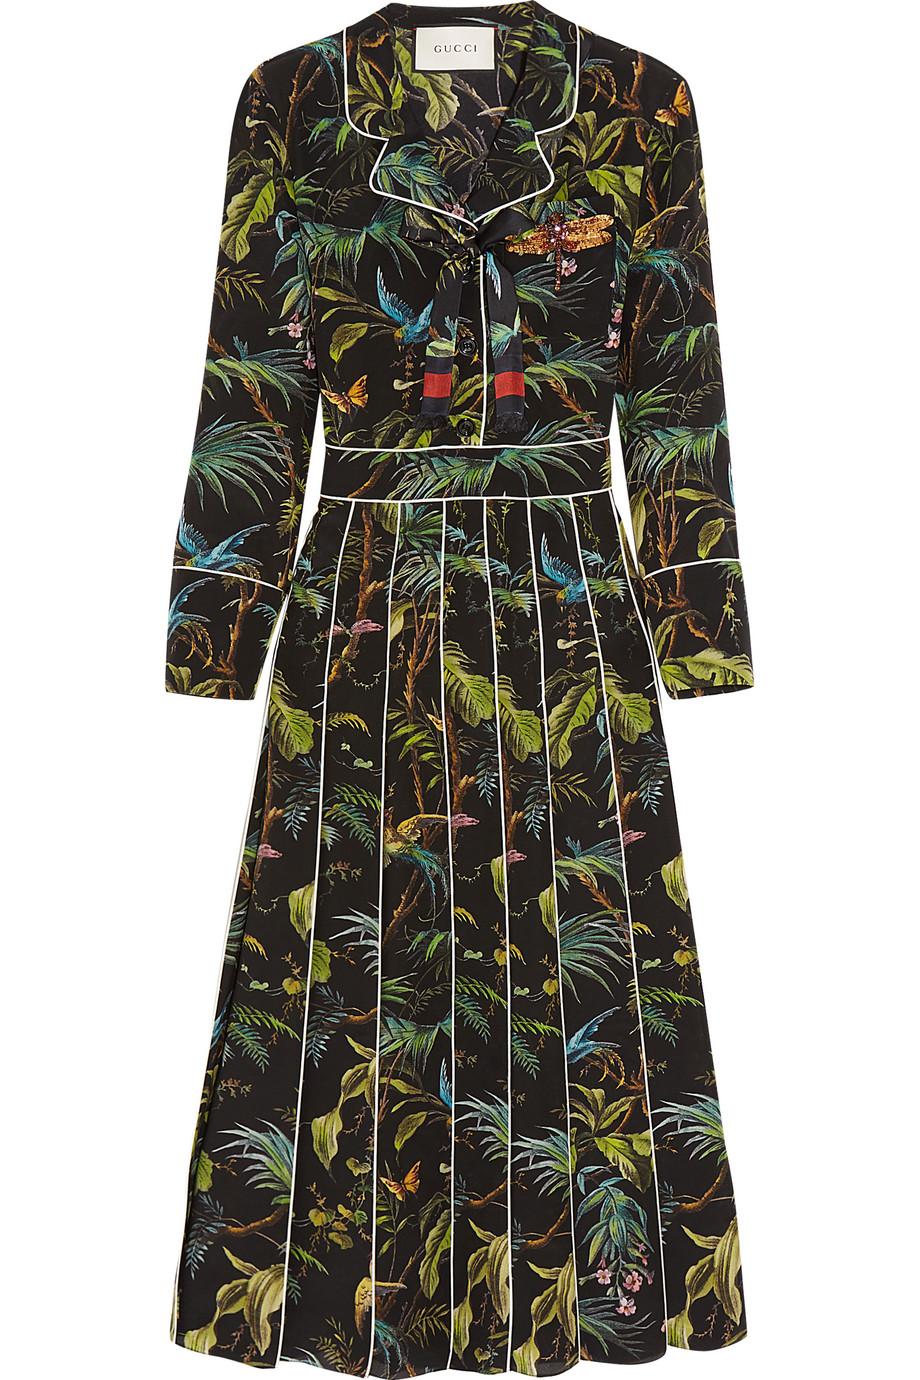 Gucci Embellished Printed Silk Crepe De Chine Midi Dress, Size: 46